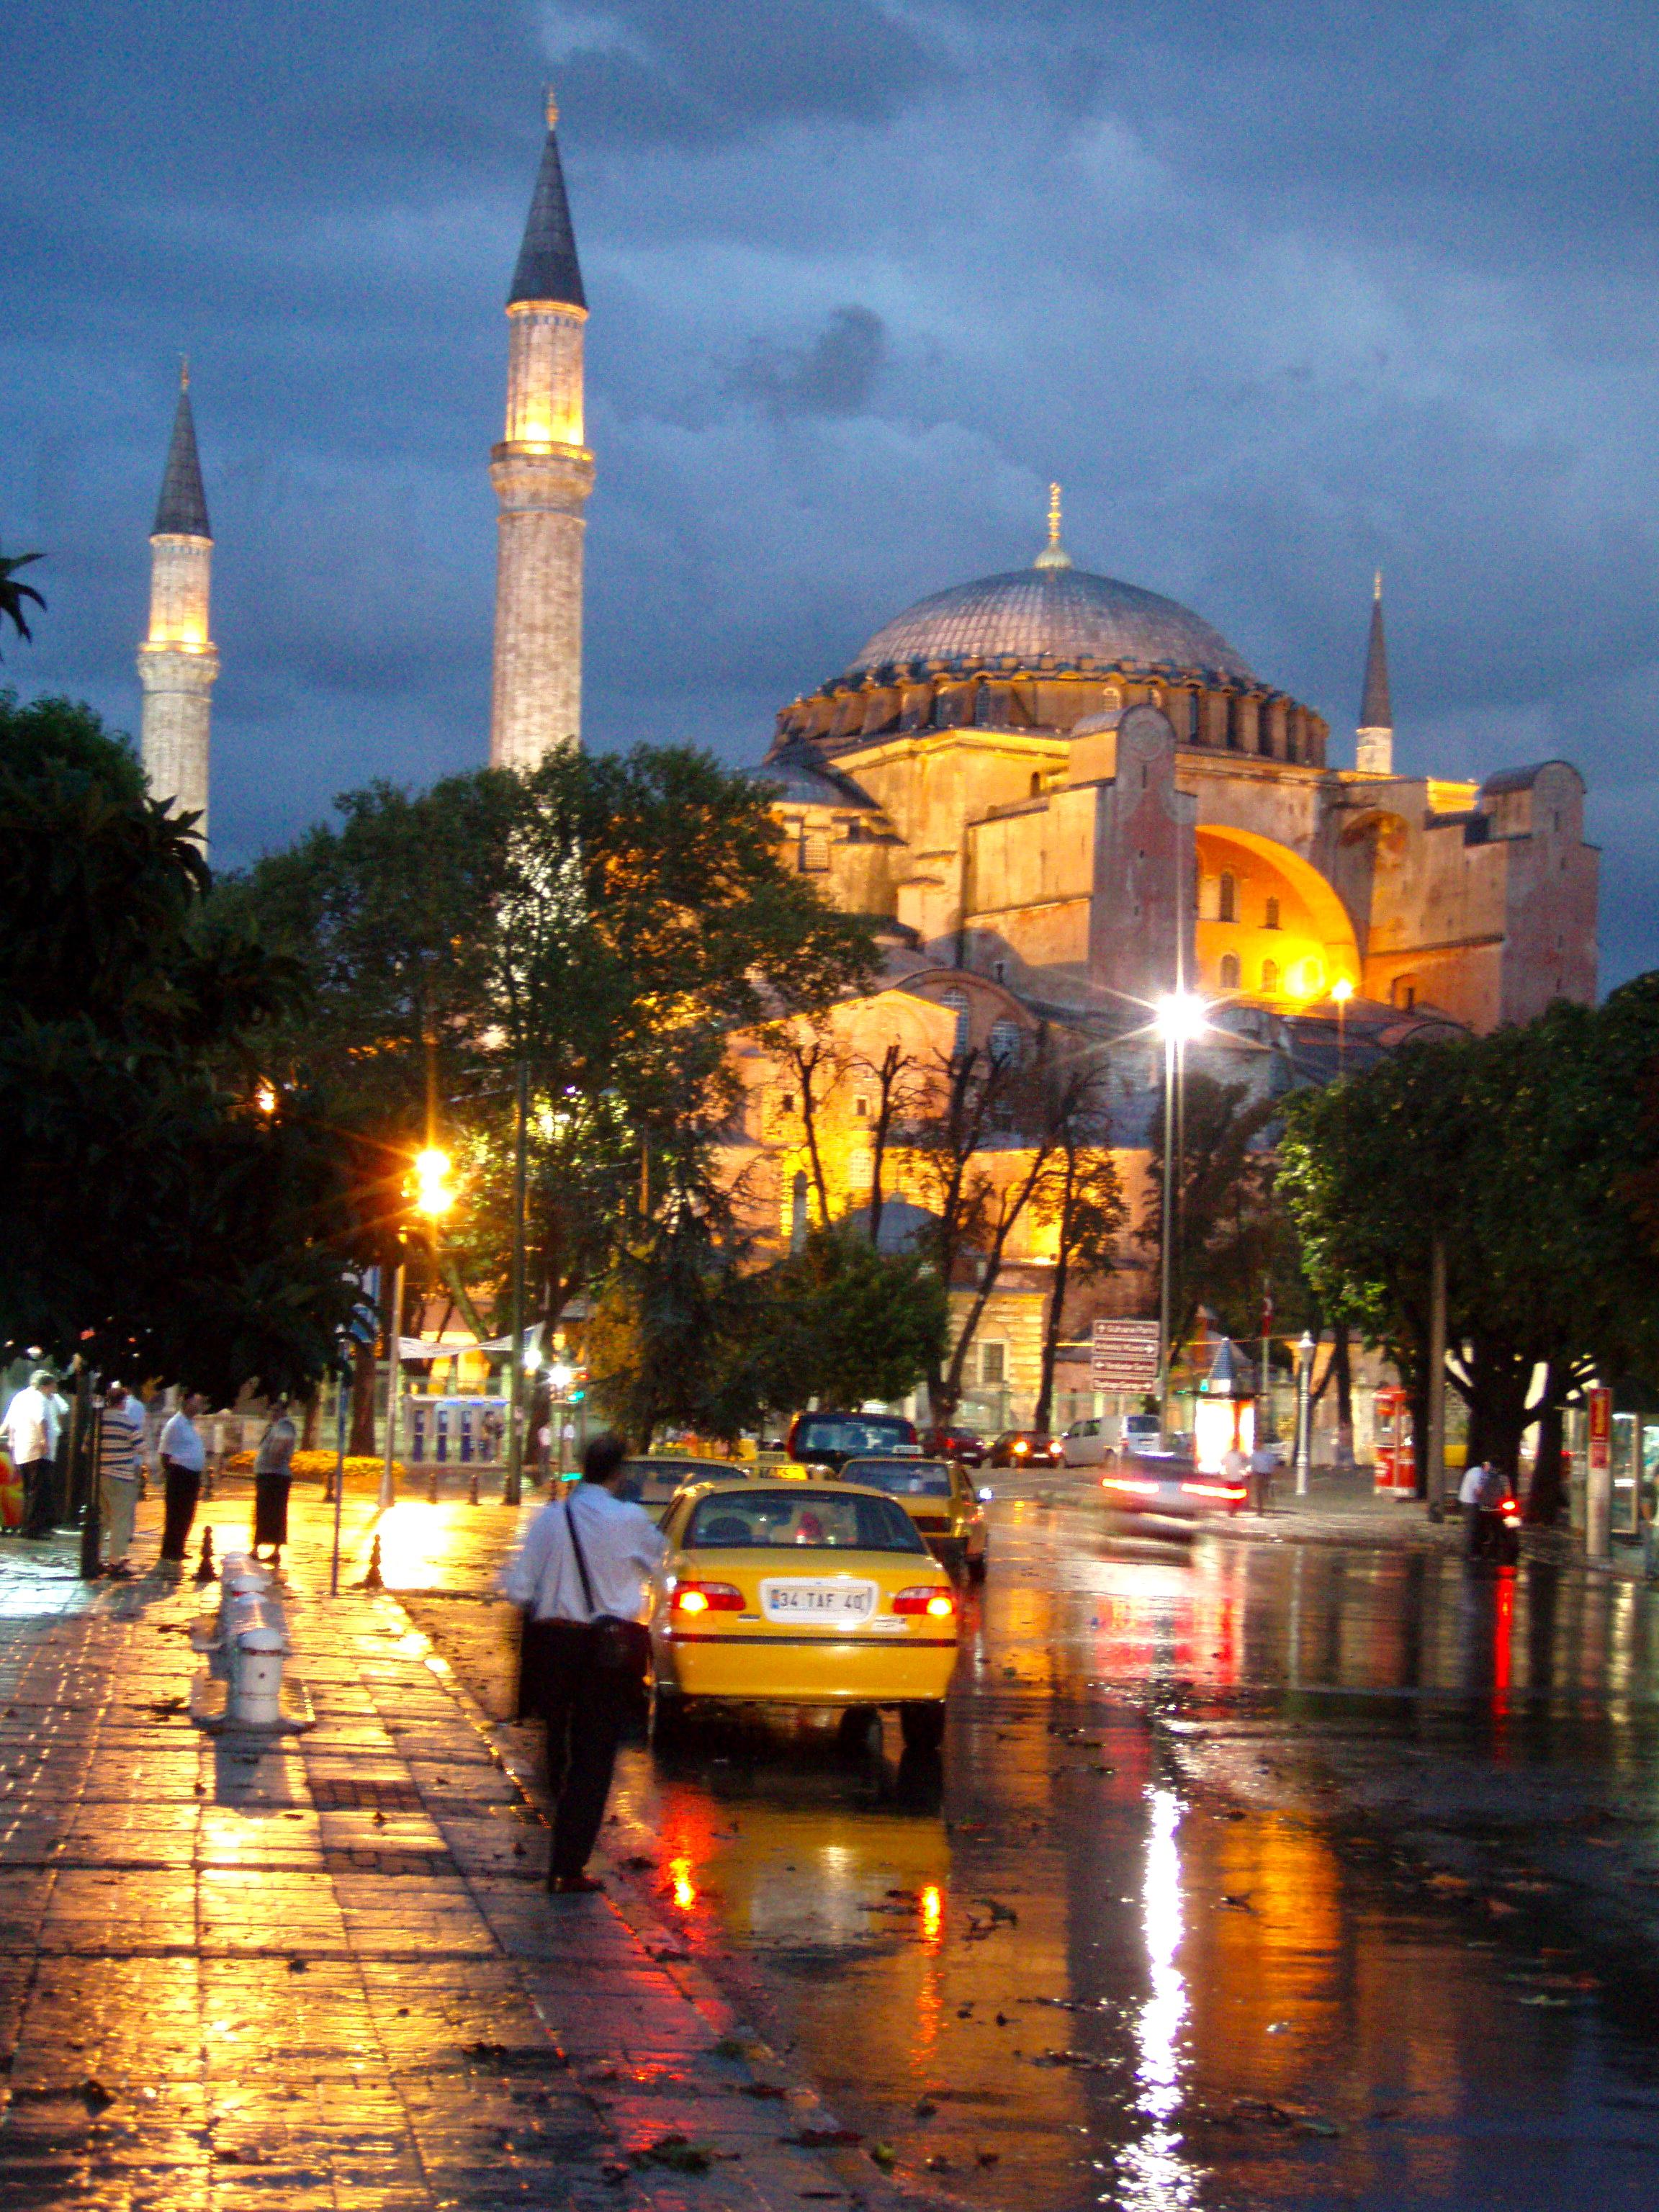 FileView Of The Hagia Sophia Ayasofya At Night